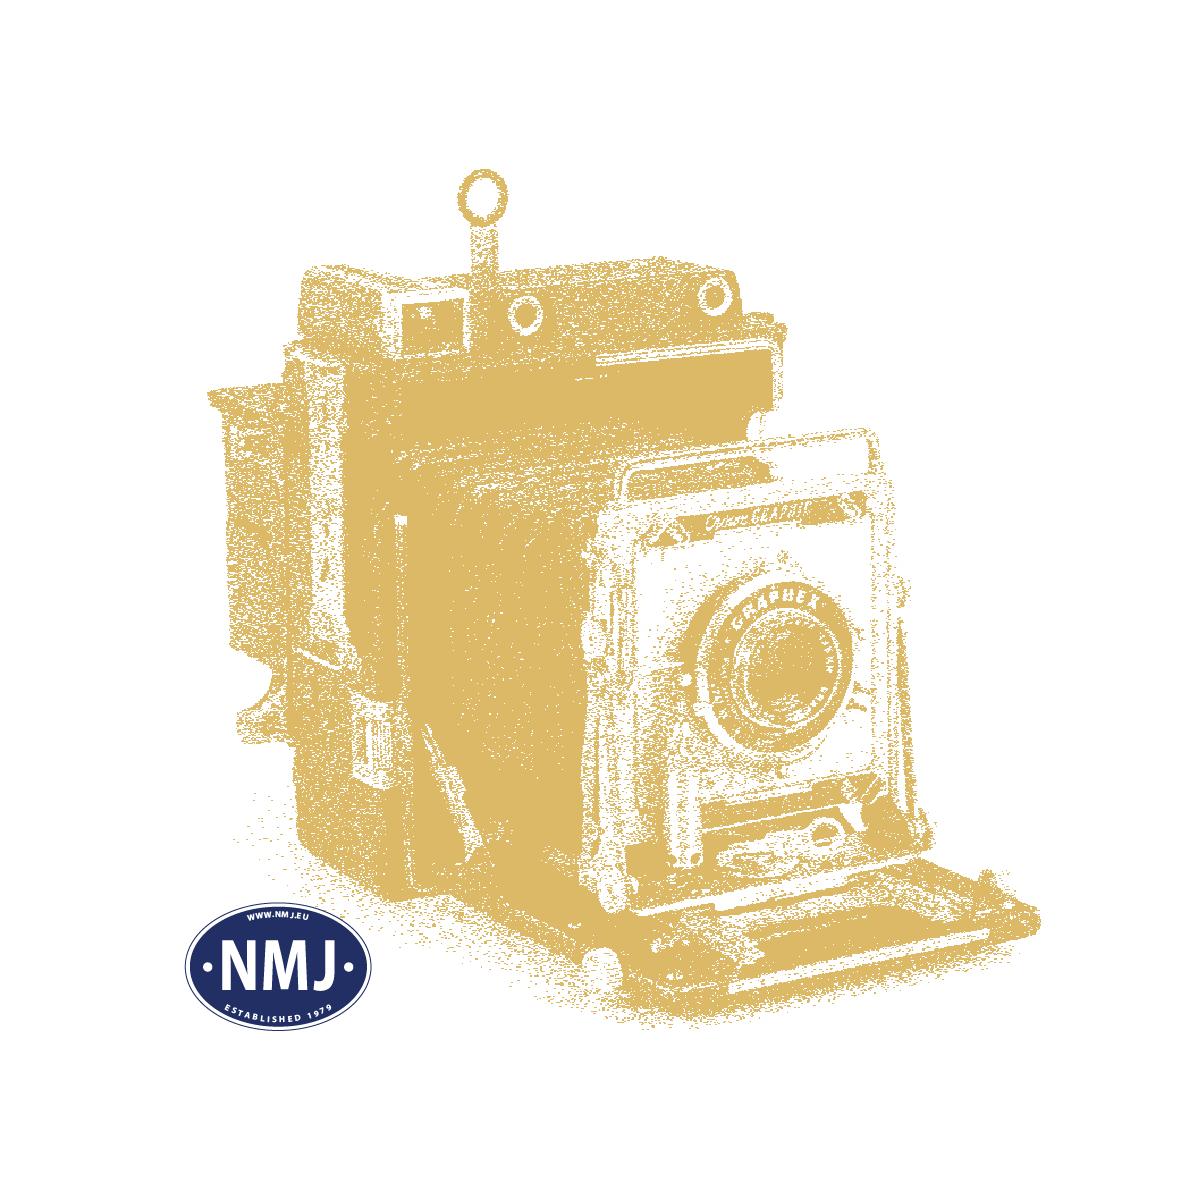 NMJKAT15 - NMJ Katalog 2015, Superline/Topline/Skyline